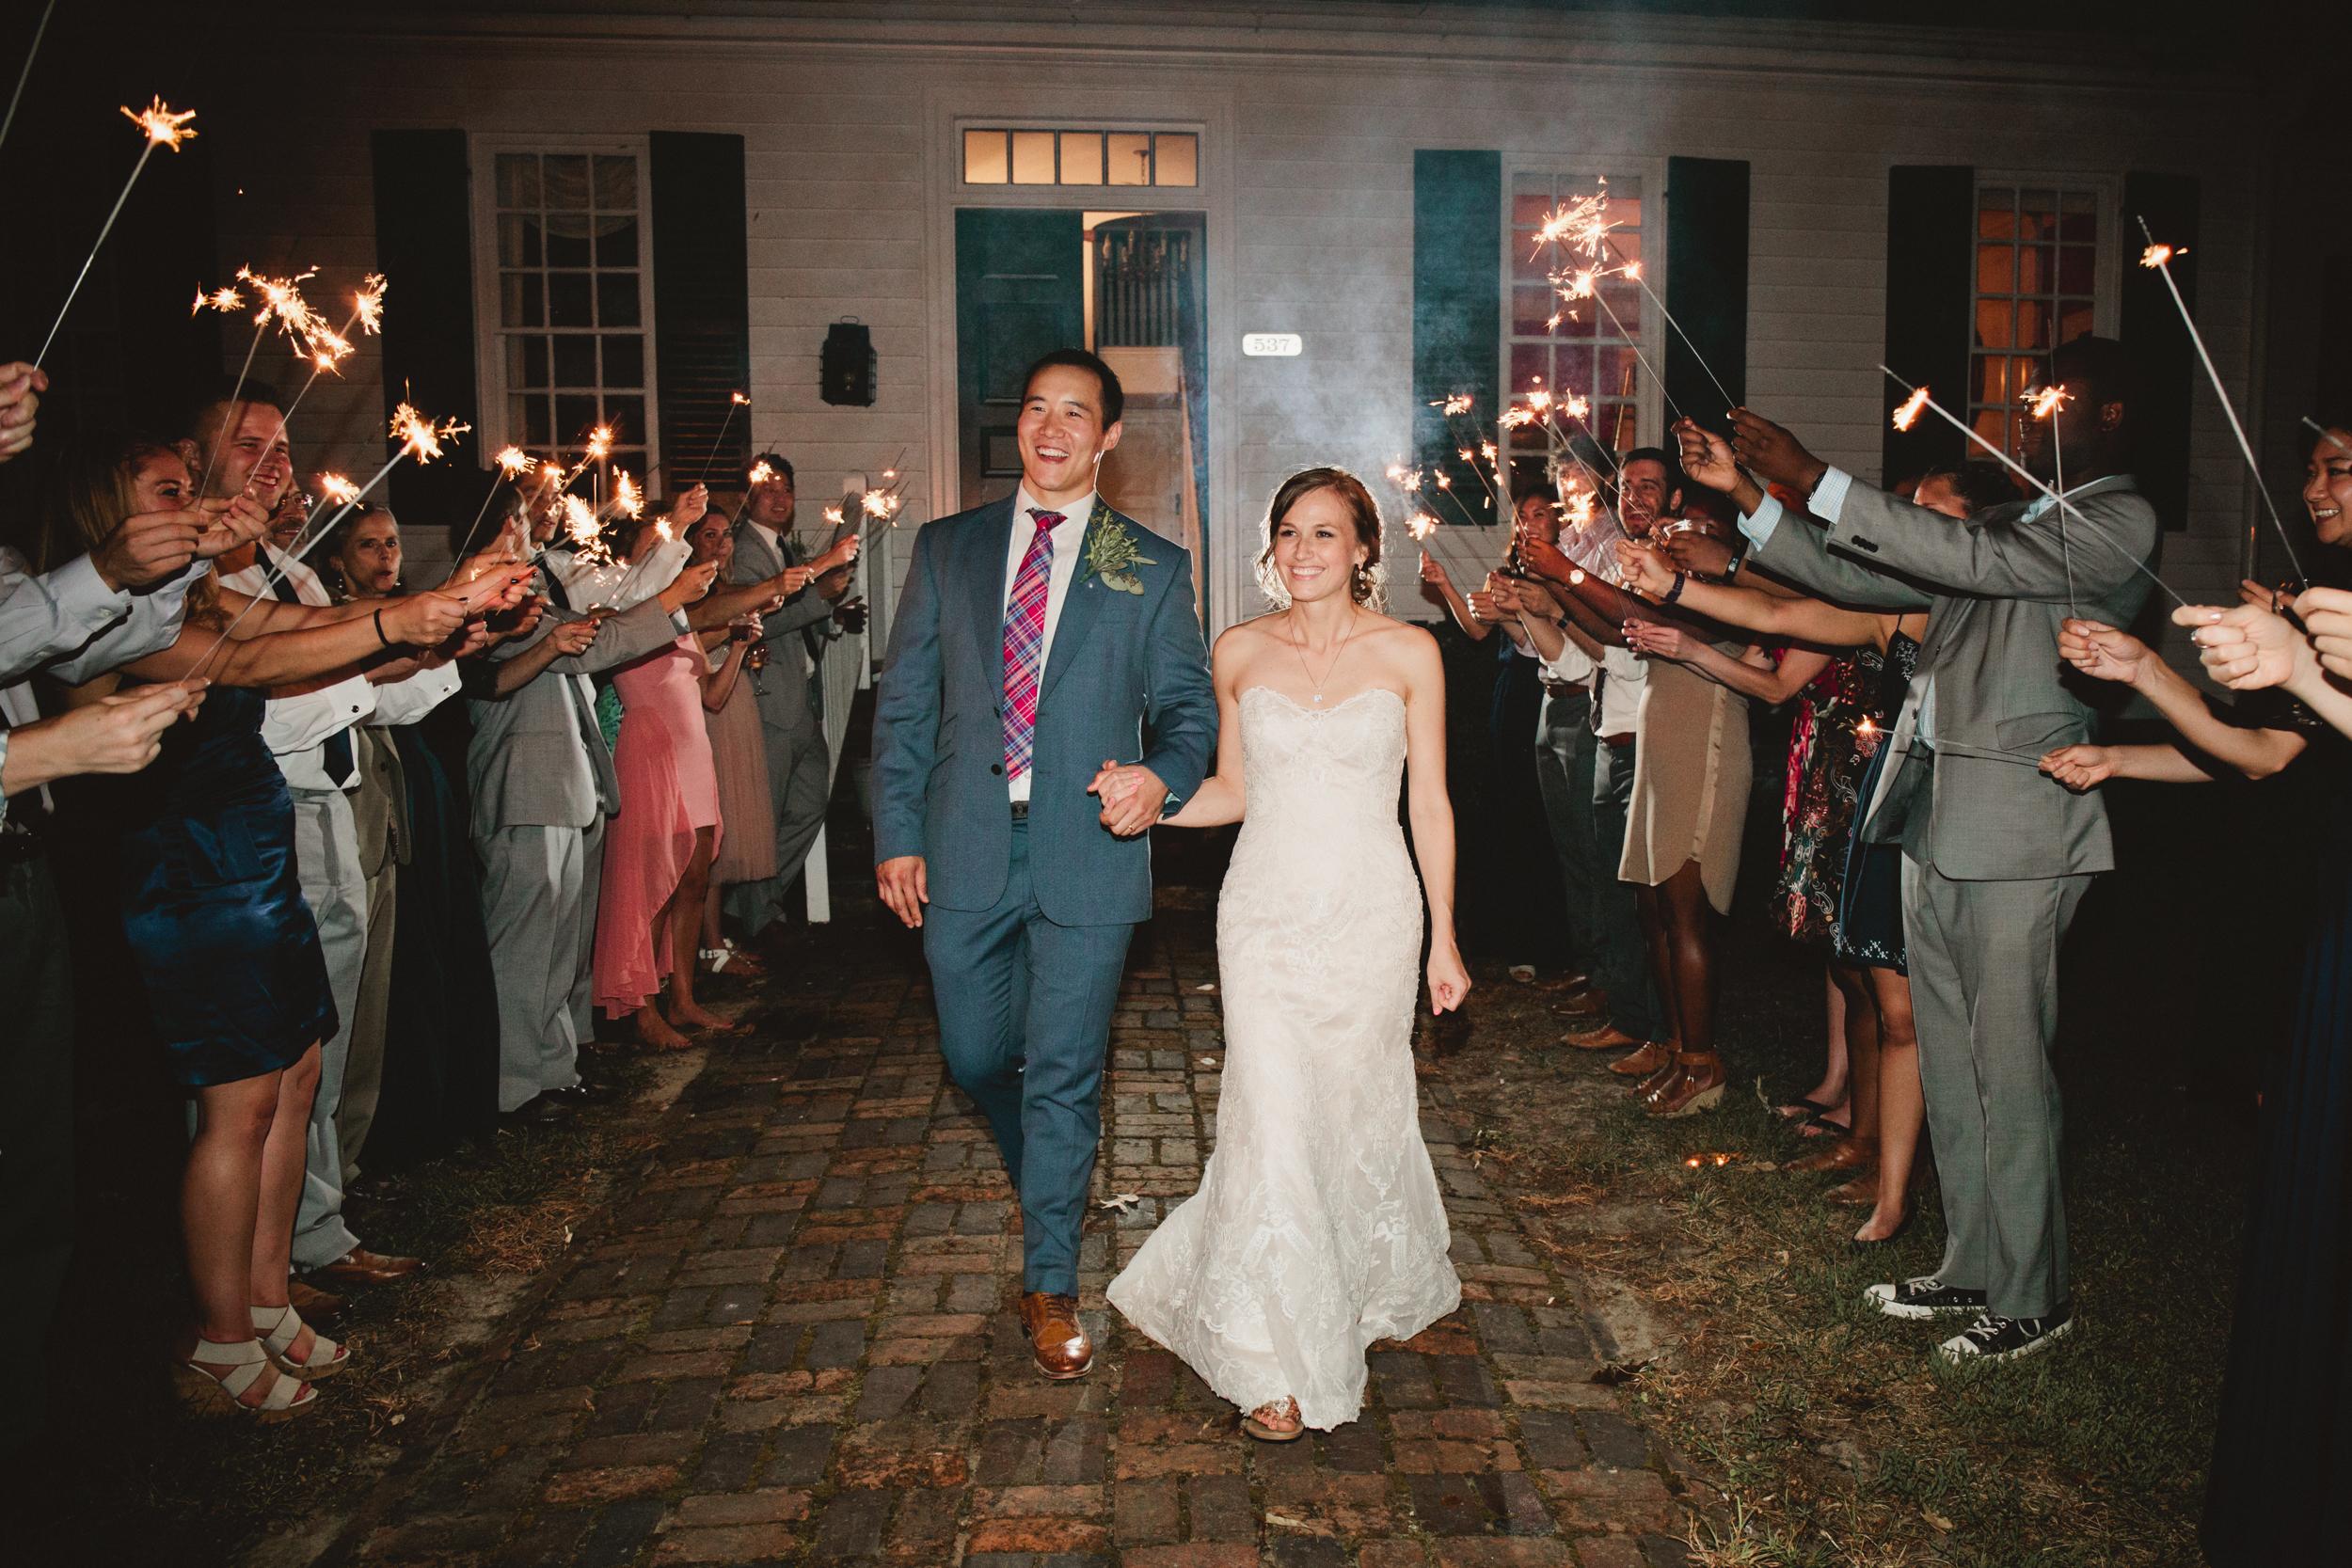 Maine-Wedding-Photographer-1157.jpg